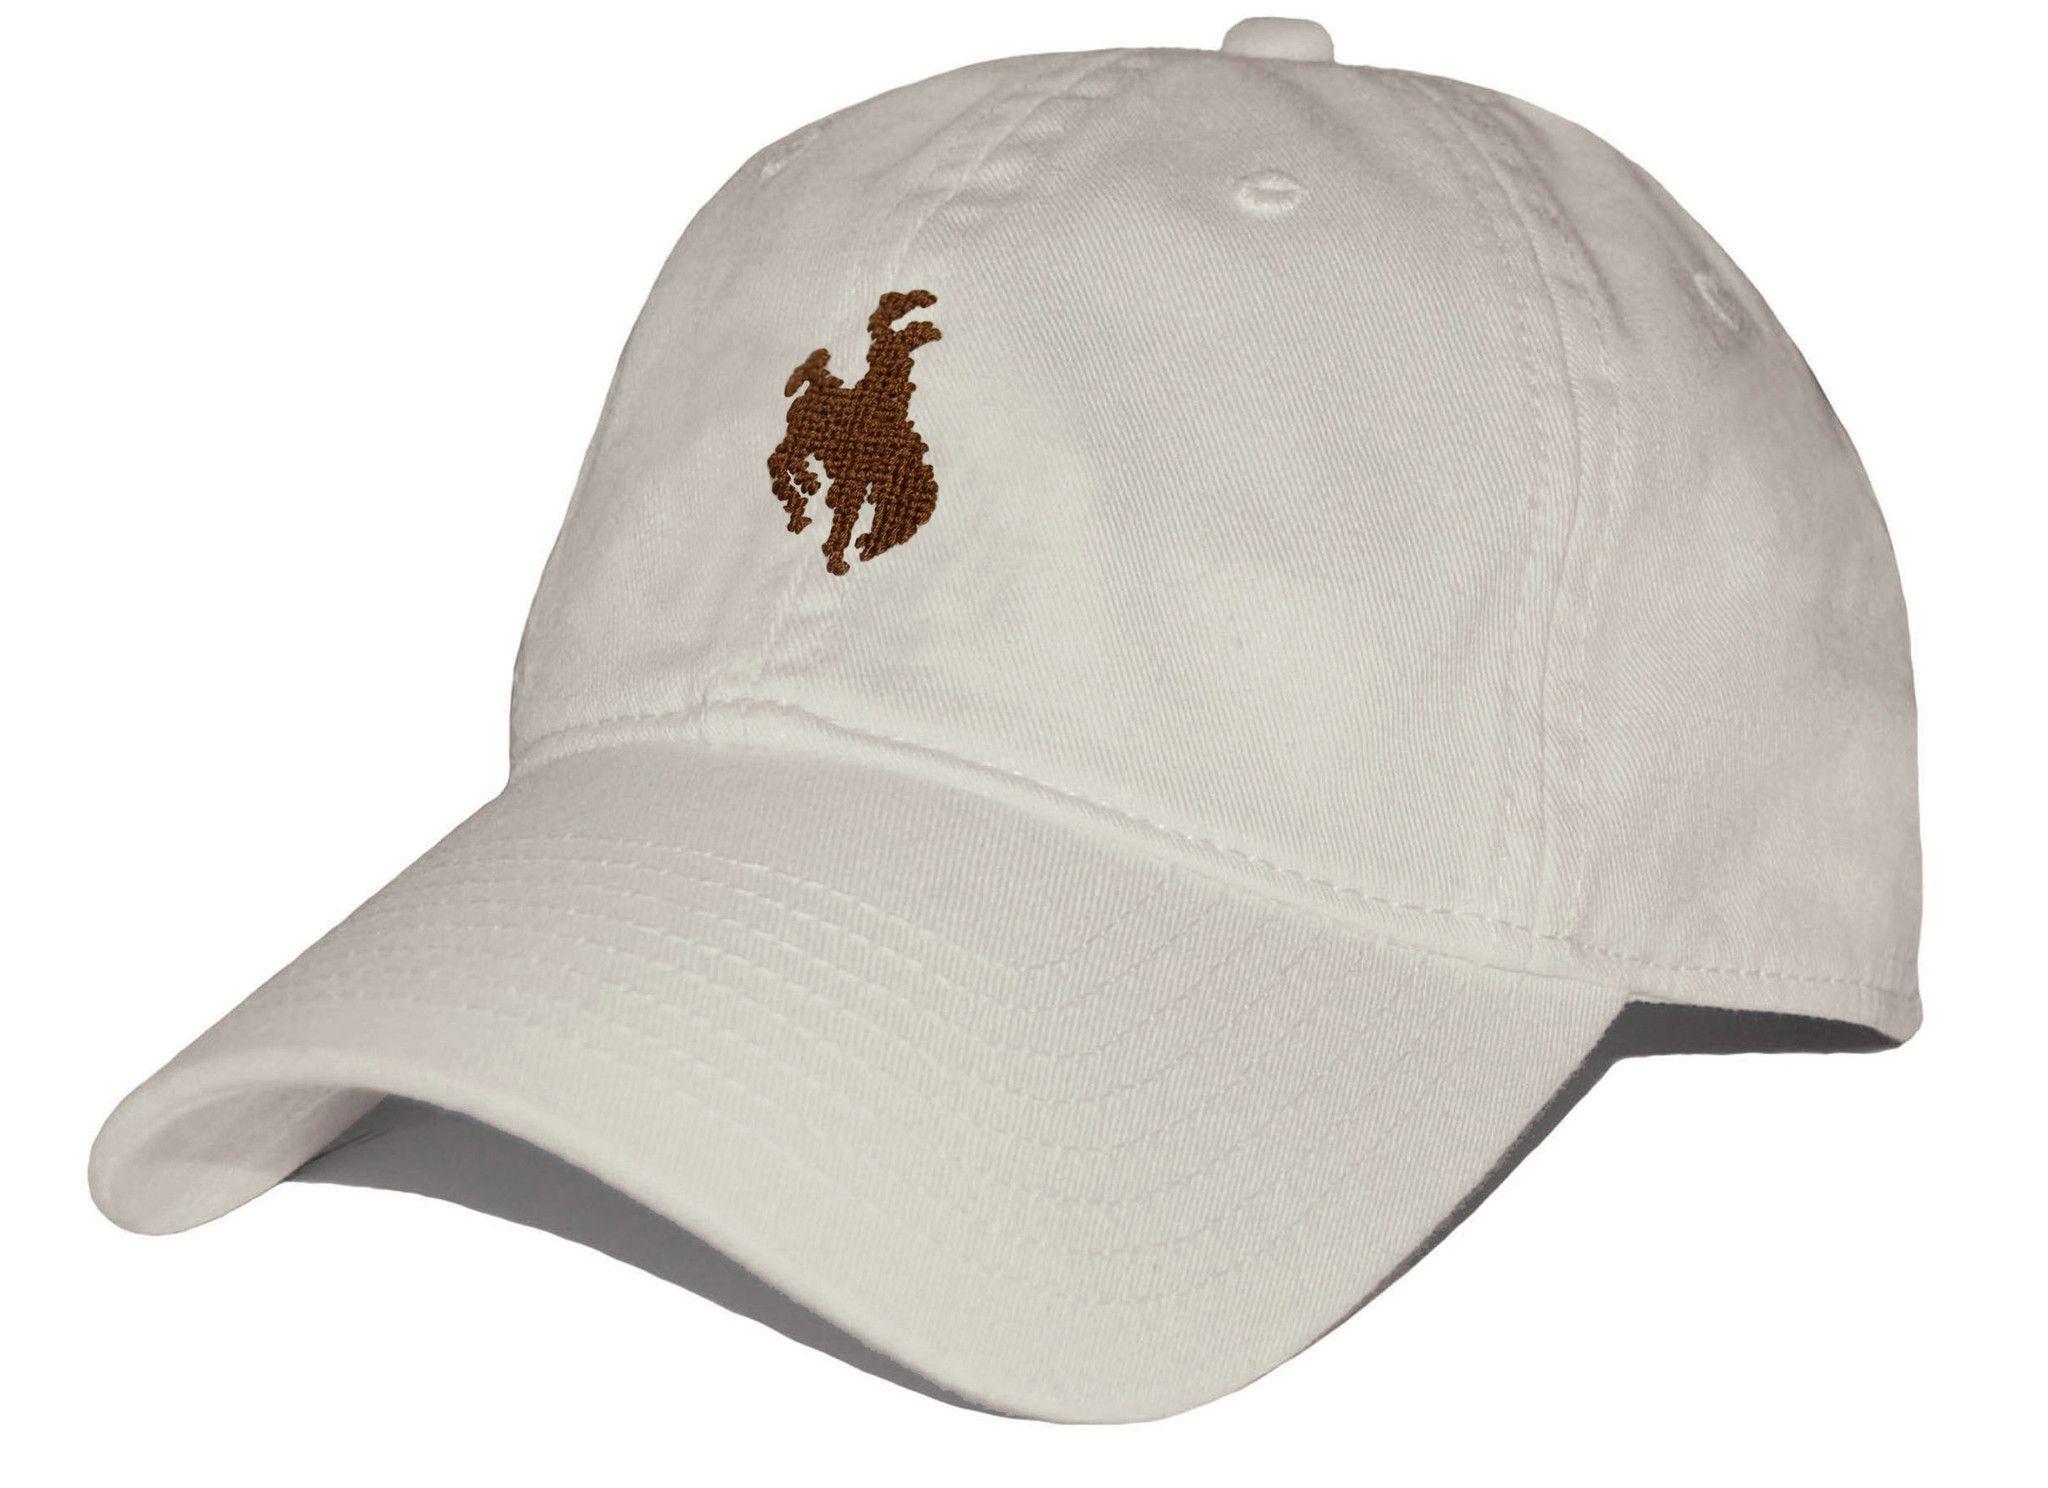 77aae2b8 Bucking Bronco Needlepoint Hat in Stone by Smathers & Branson Usa Flag,  Seersucker, Stone